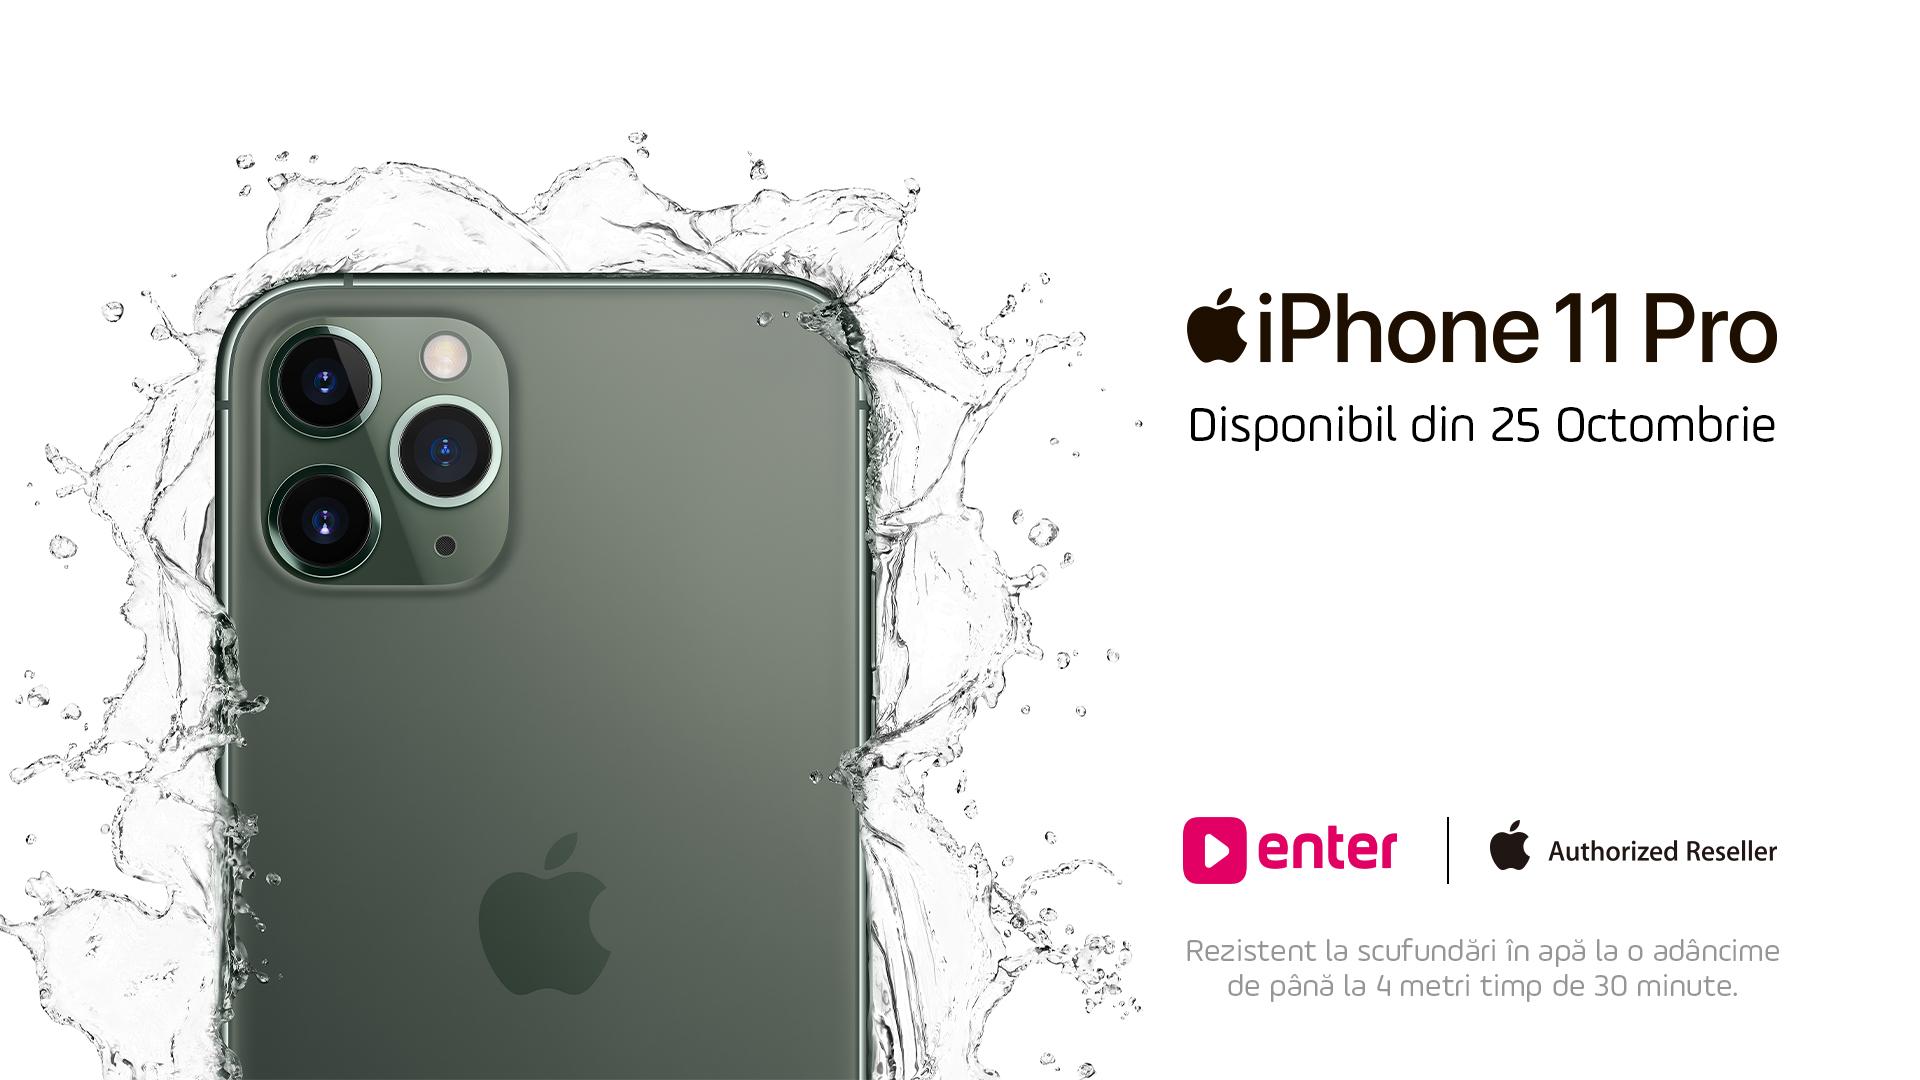 RO iPhone 11 Pro 1920_1080